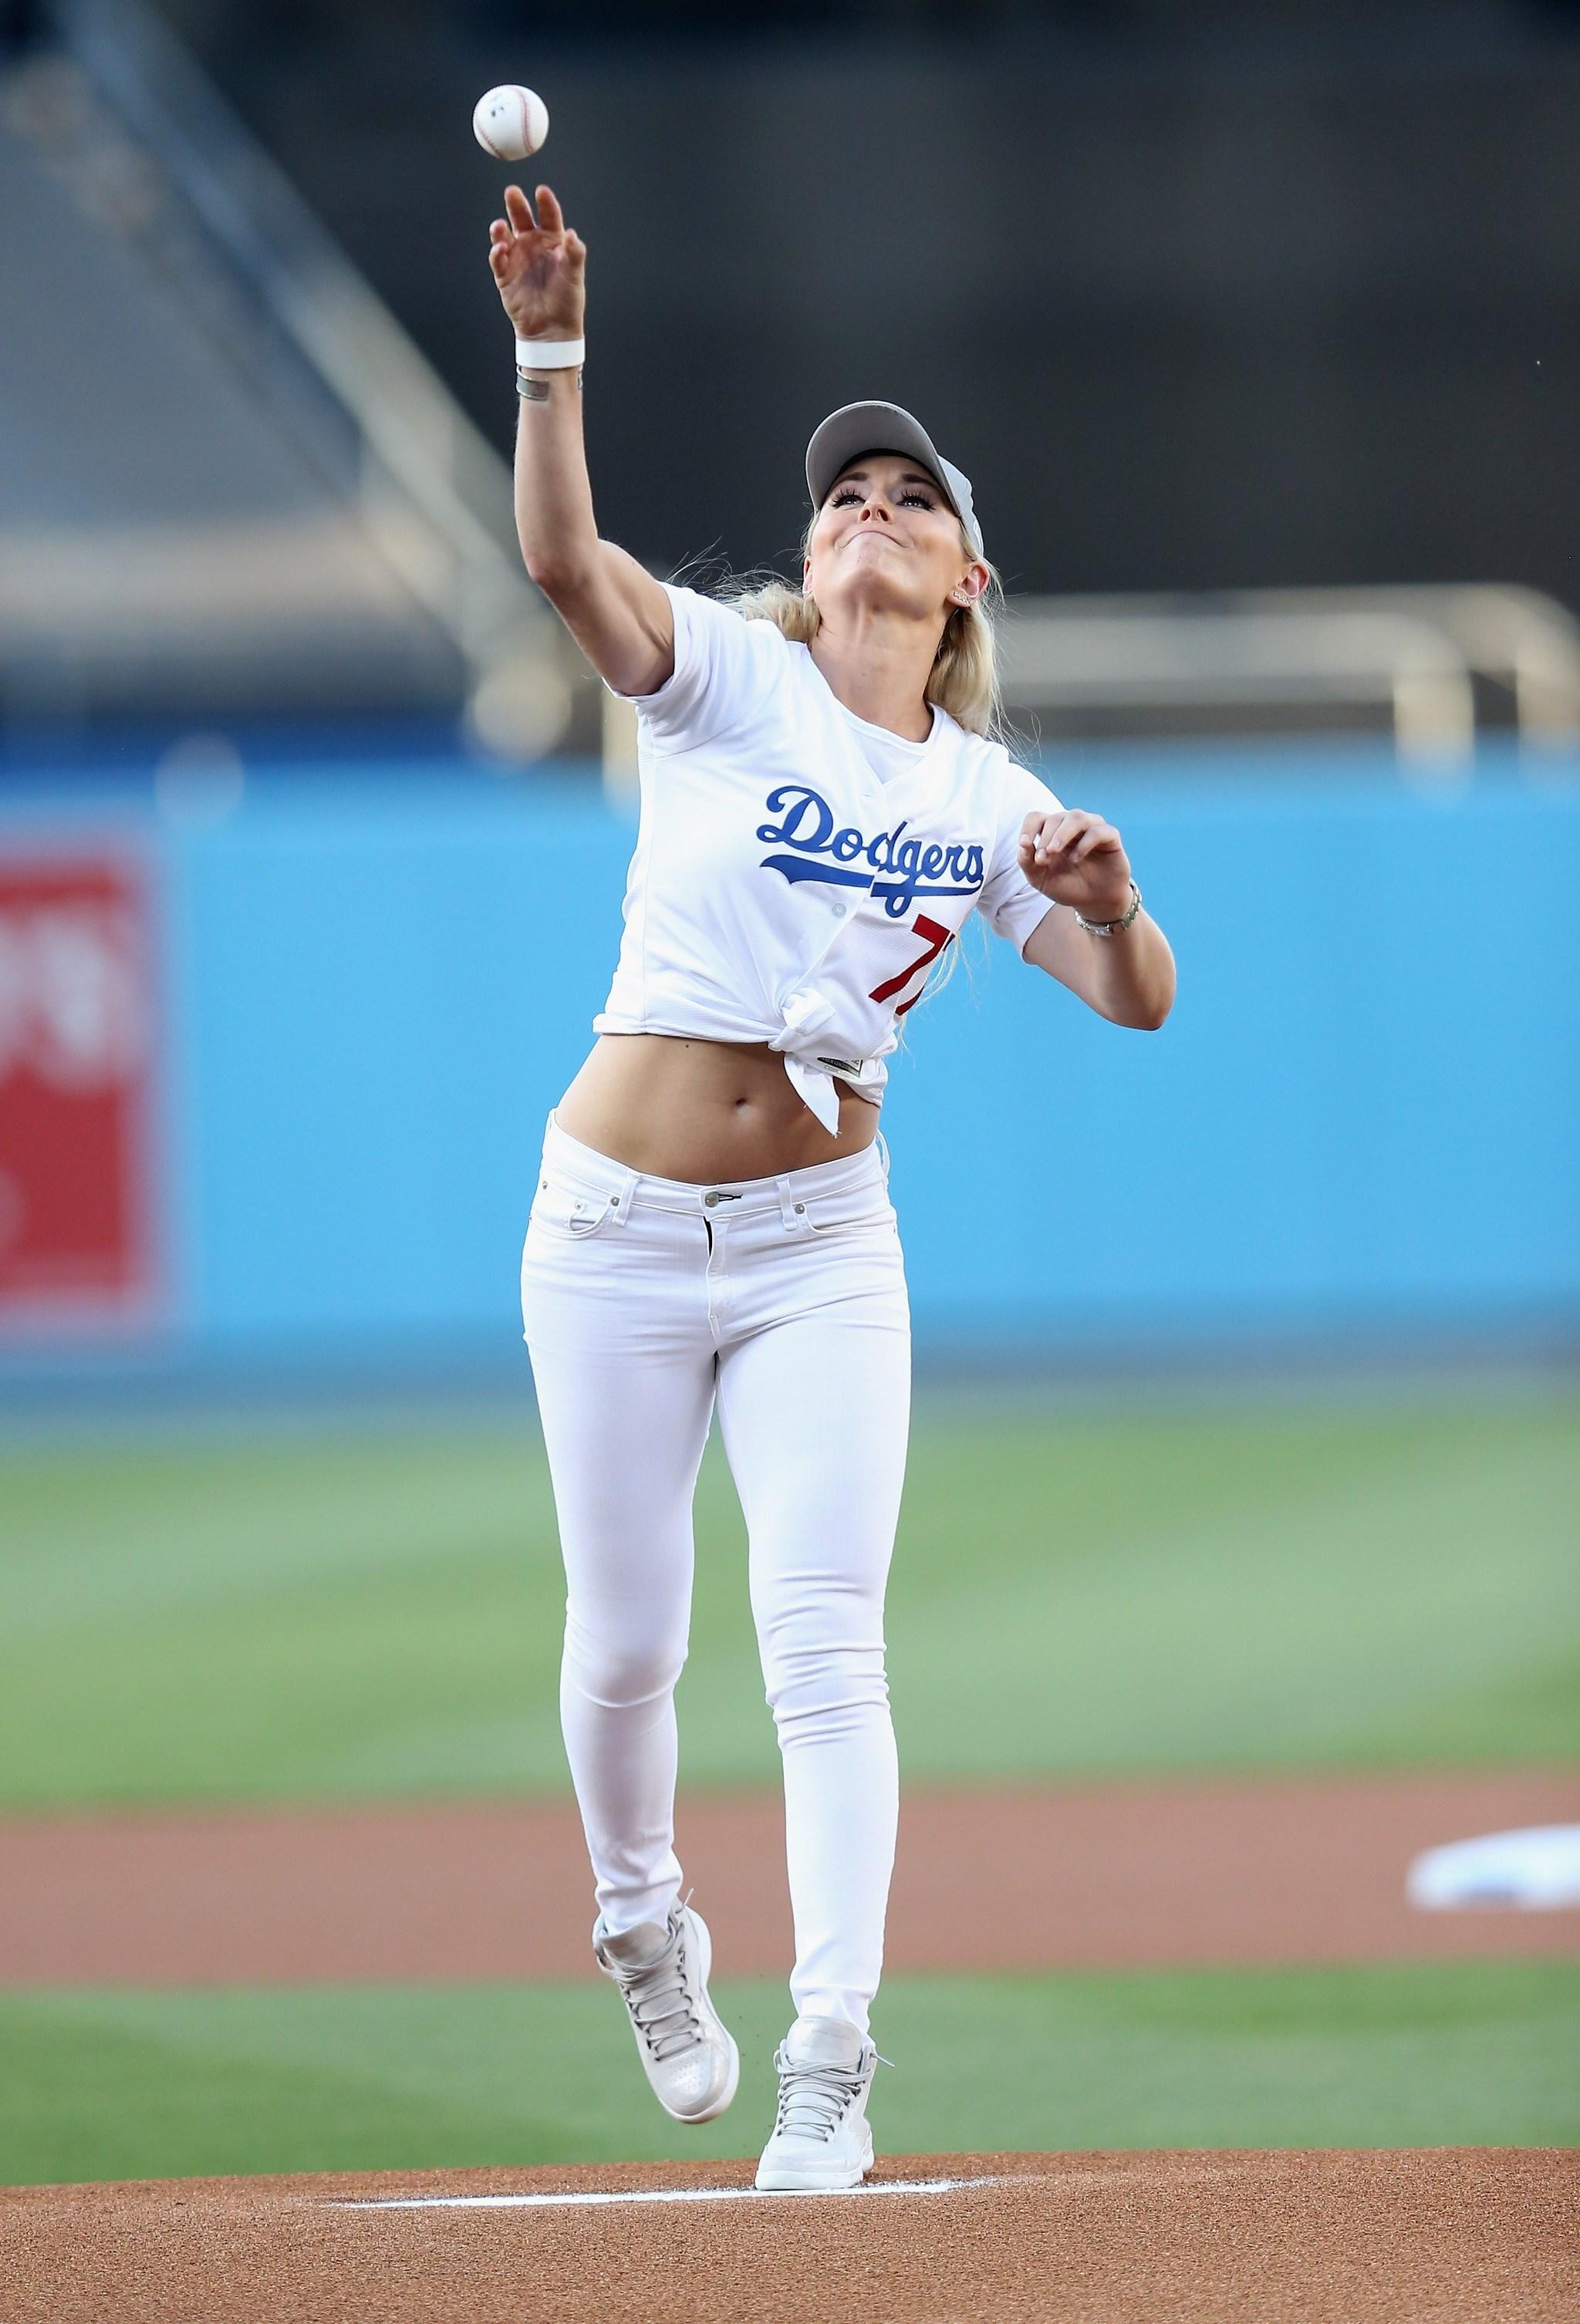 Lindsey Vonn realizó el 'first pitch' del partido de la MLB entre...